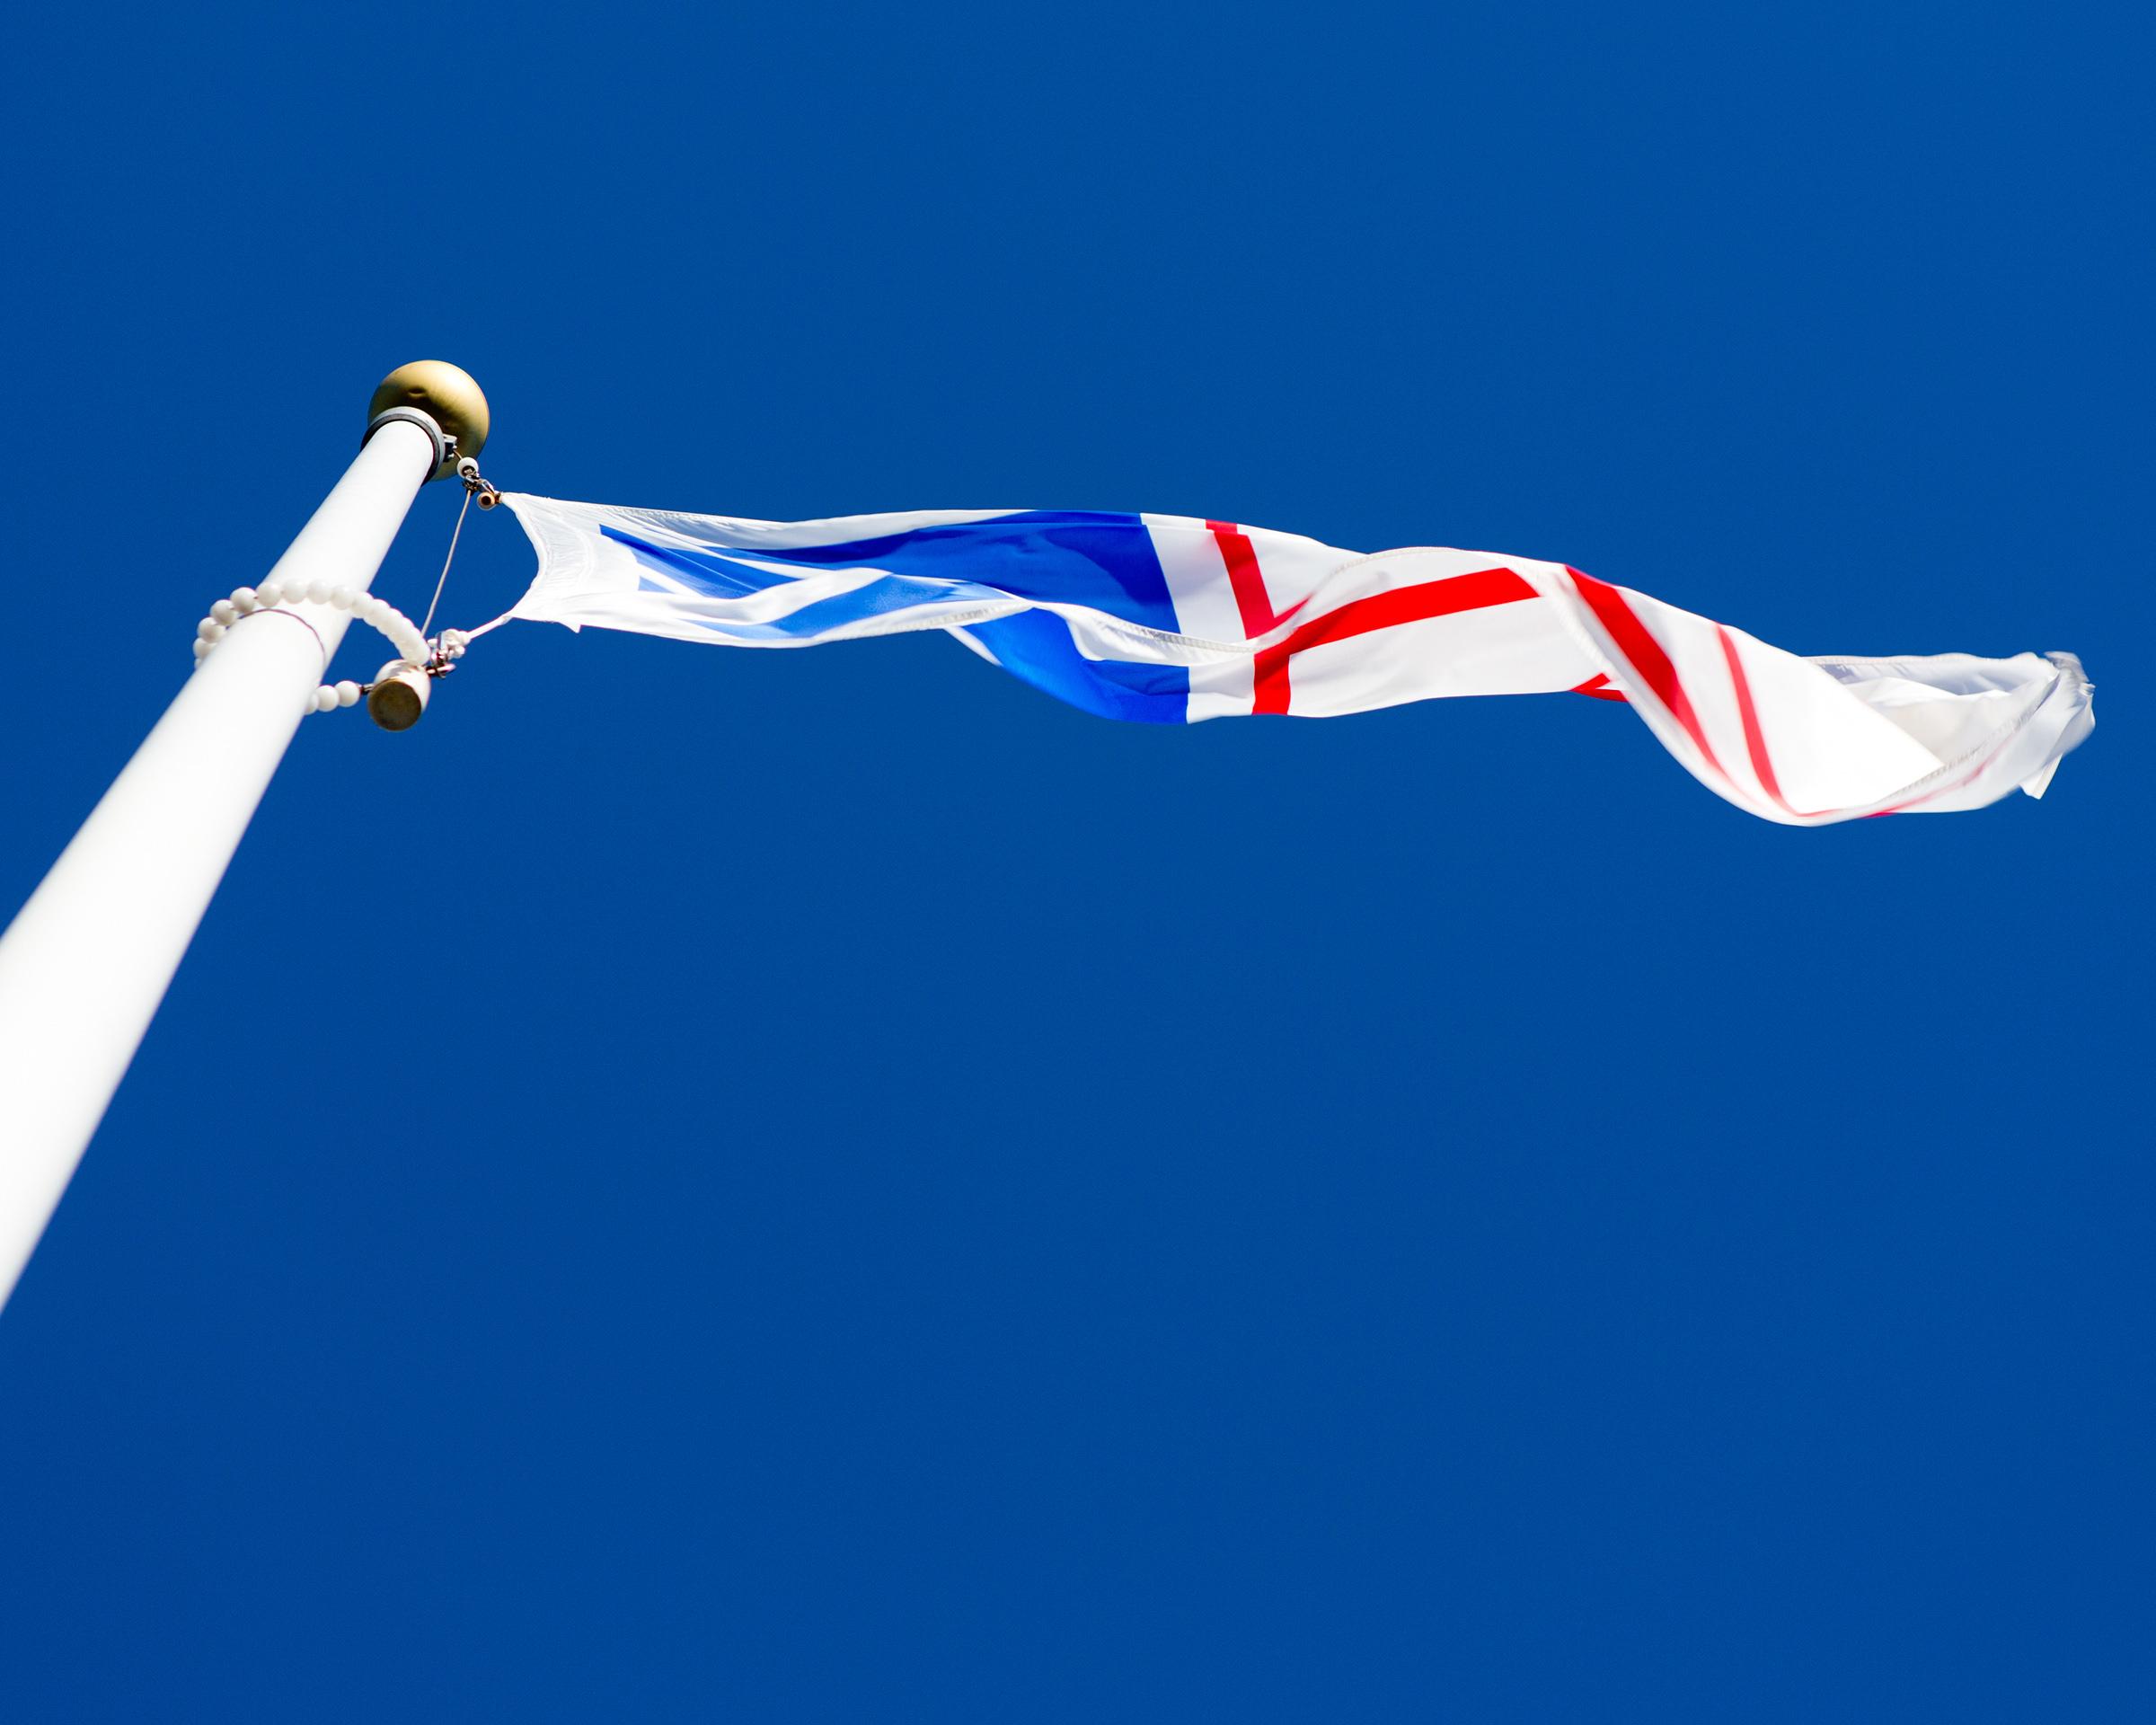 Flag, Canada, Newfoundland, Sunny, Summertime, HQ Photo